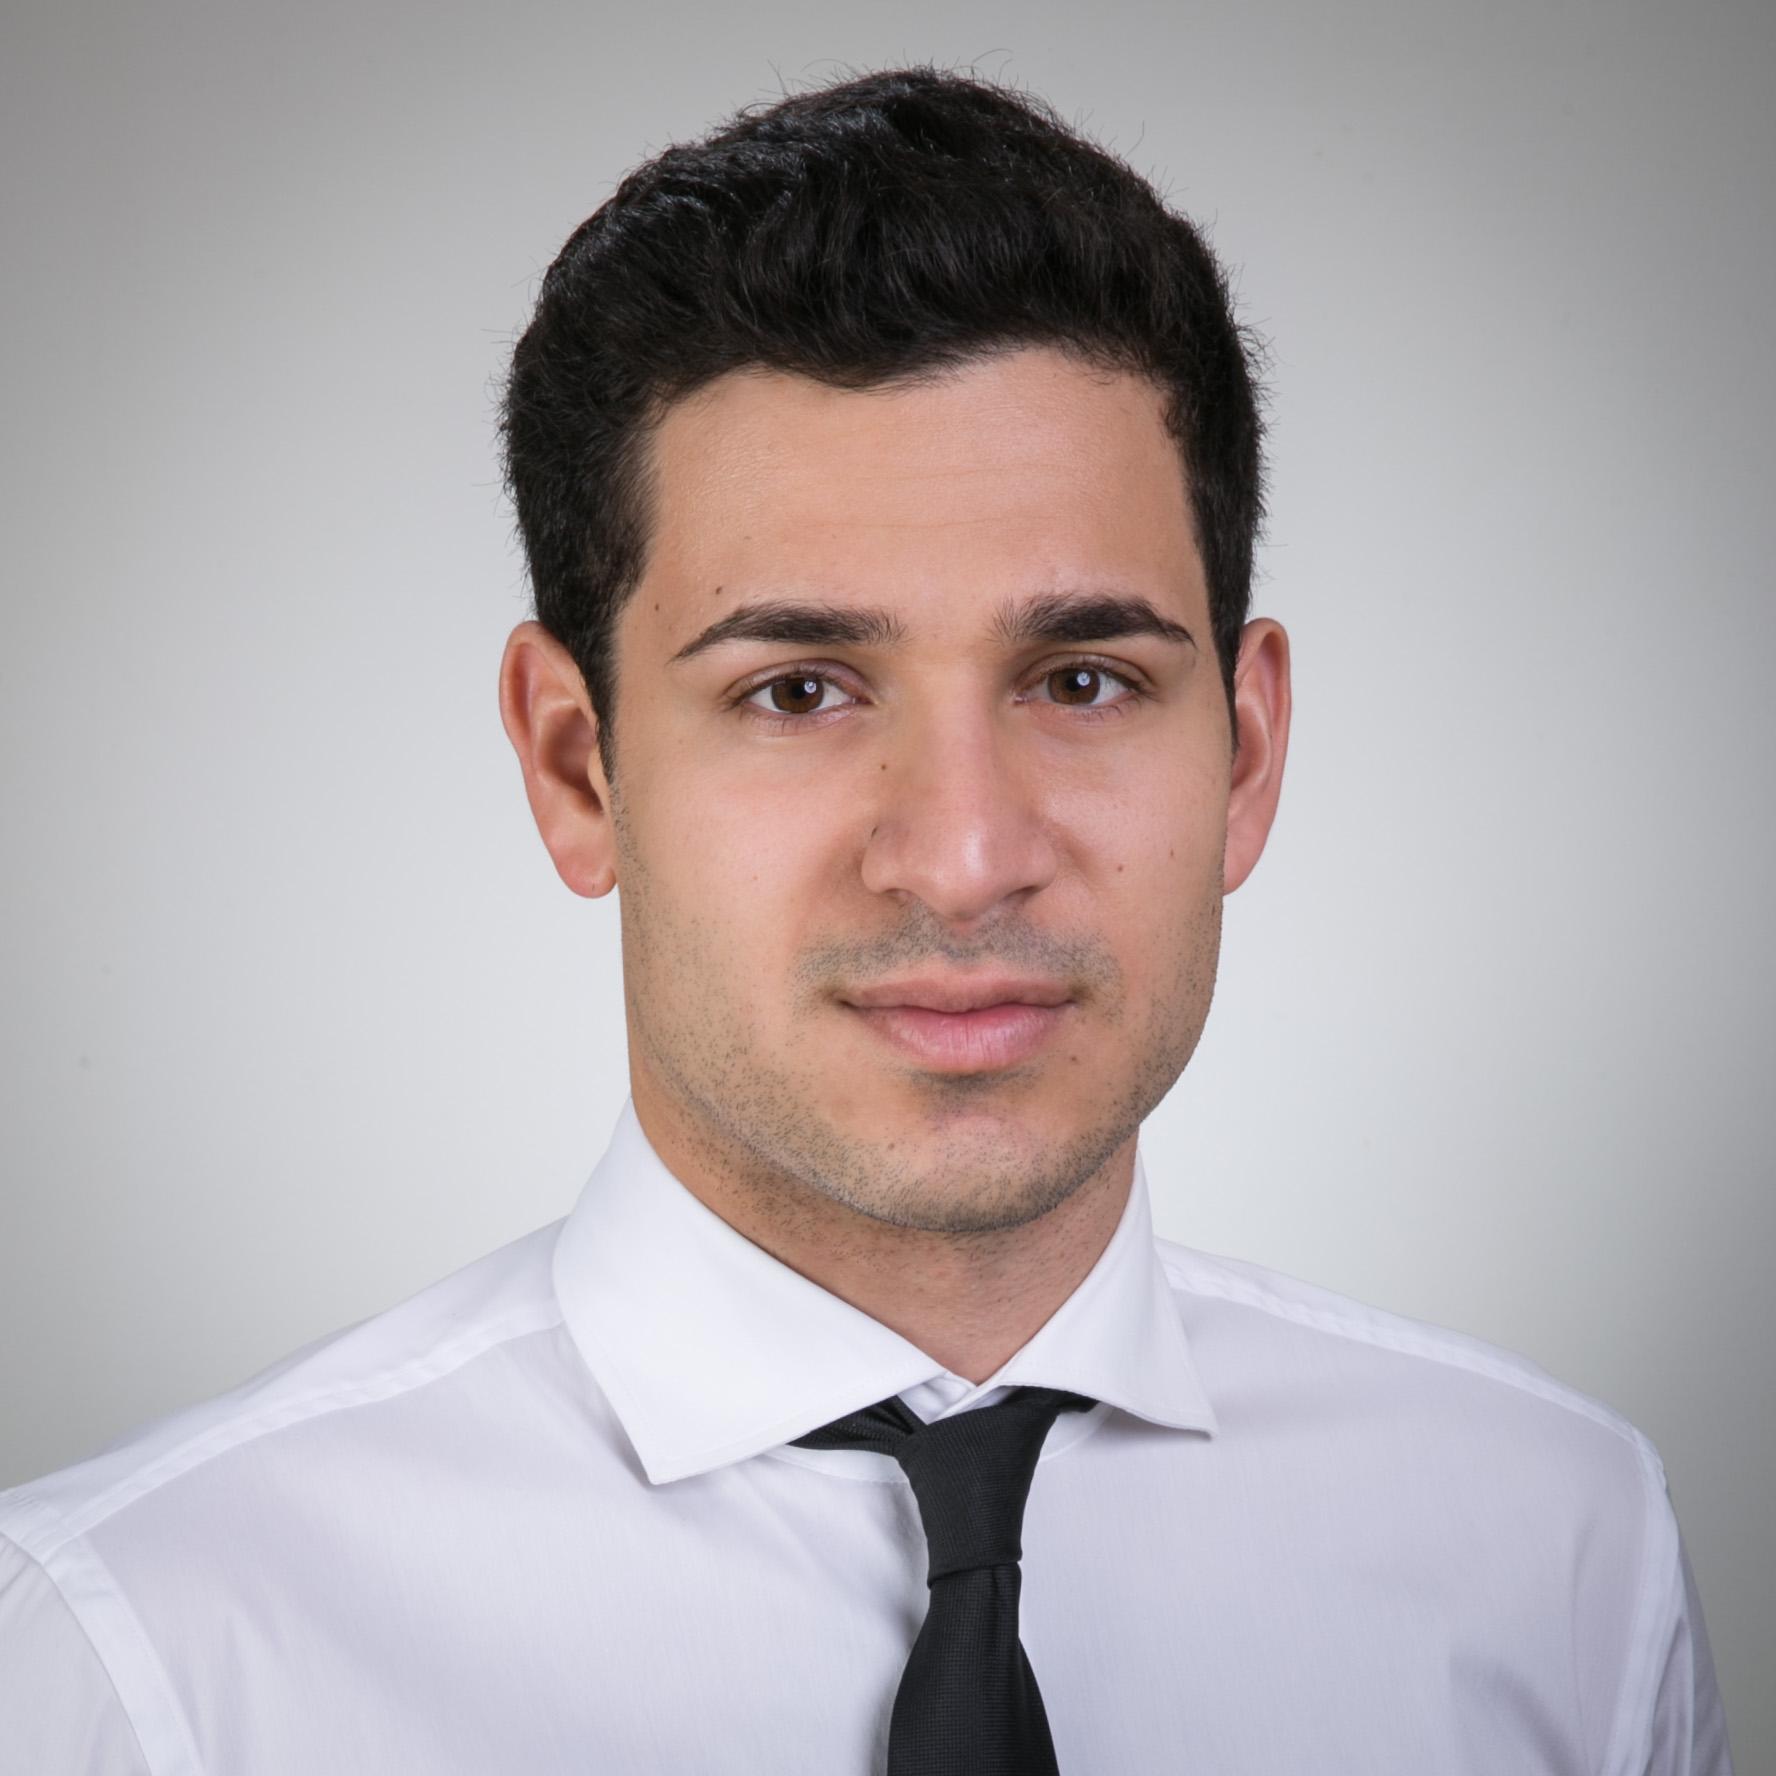 Ryan Sassounian